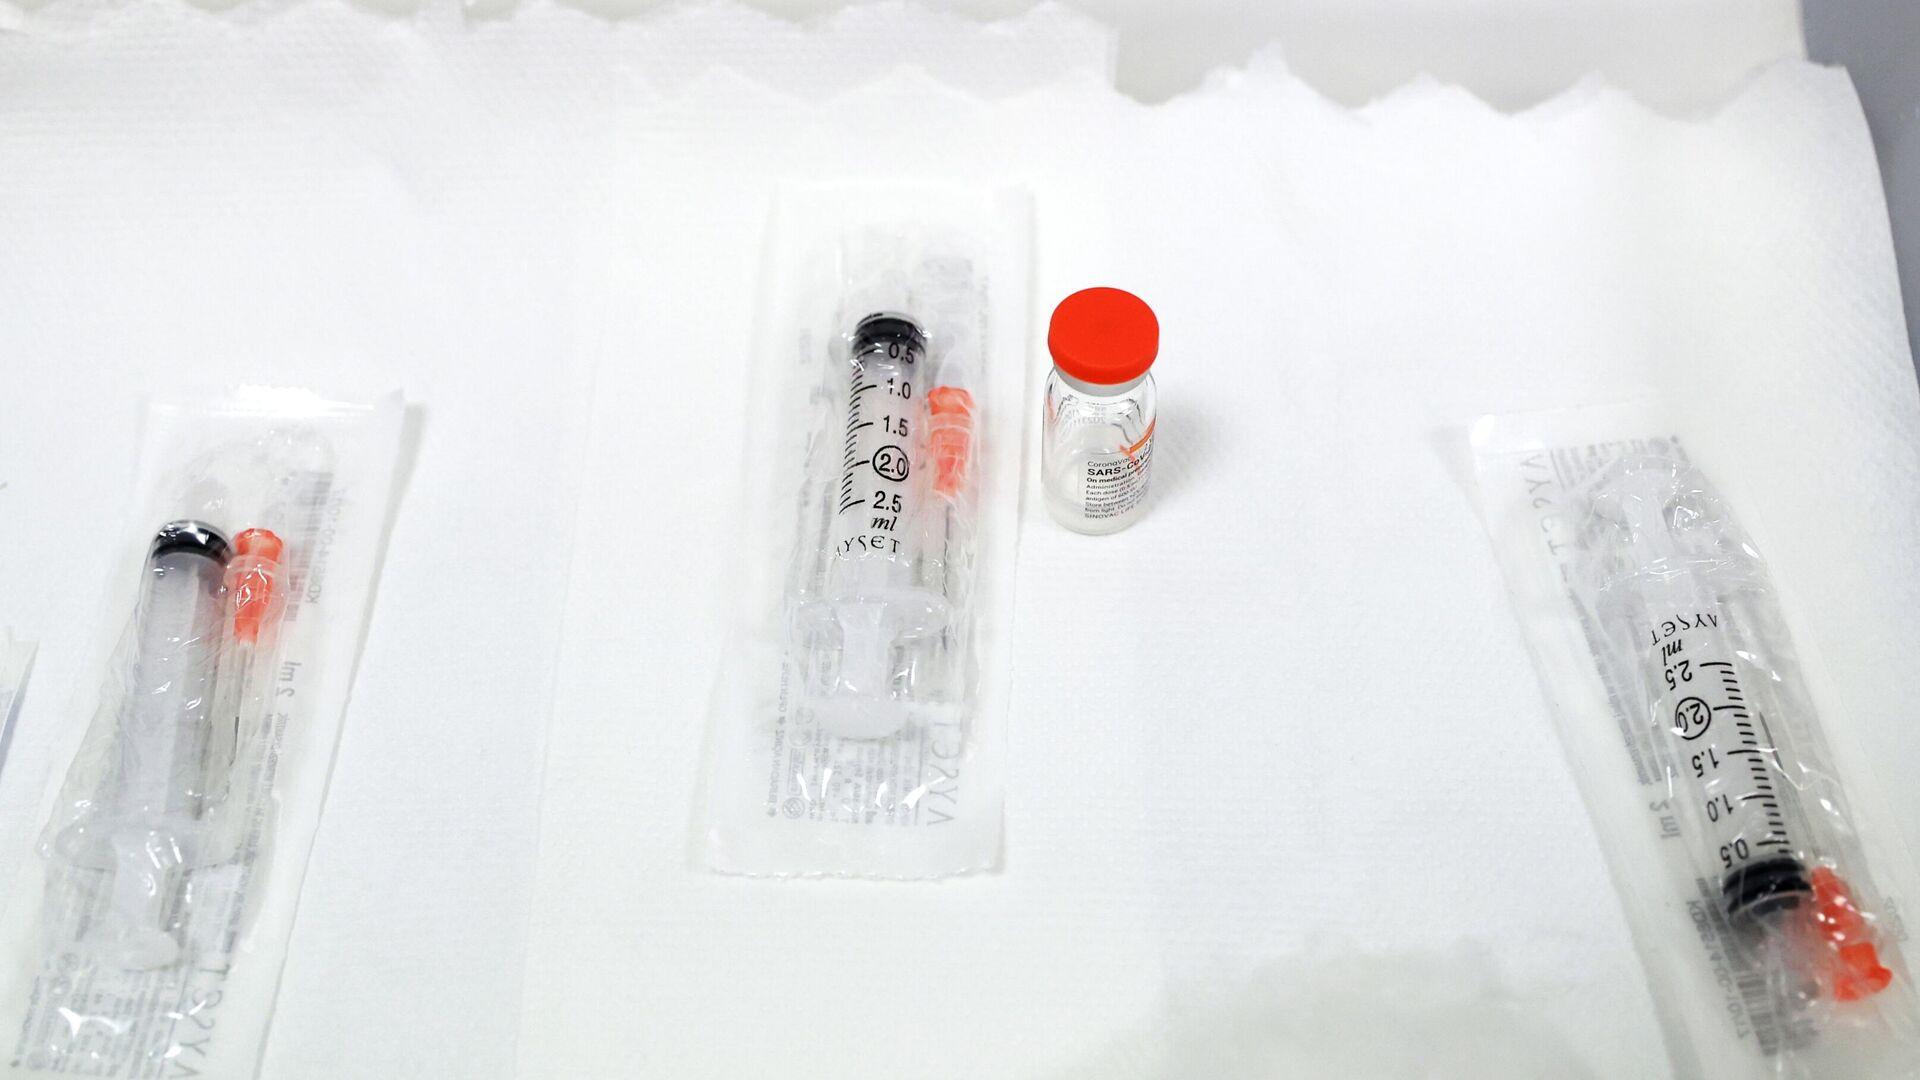 Вакцина СoronaVac китайской компании SinoVac - РИА Новости, 1920, 18.01.2021